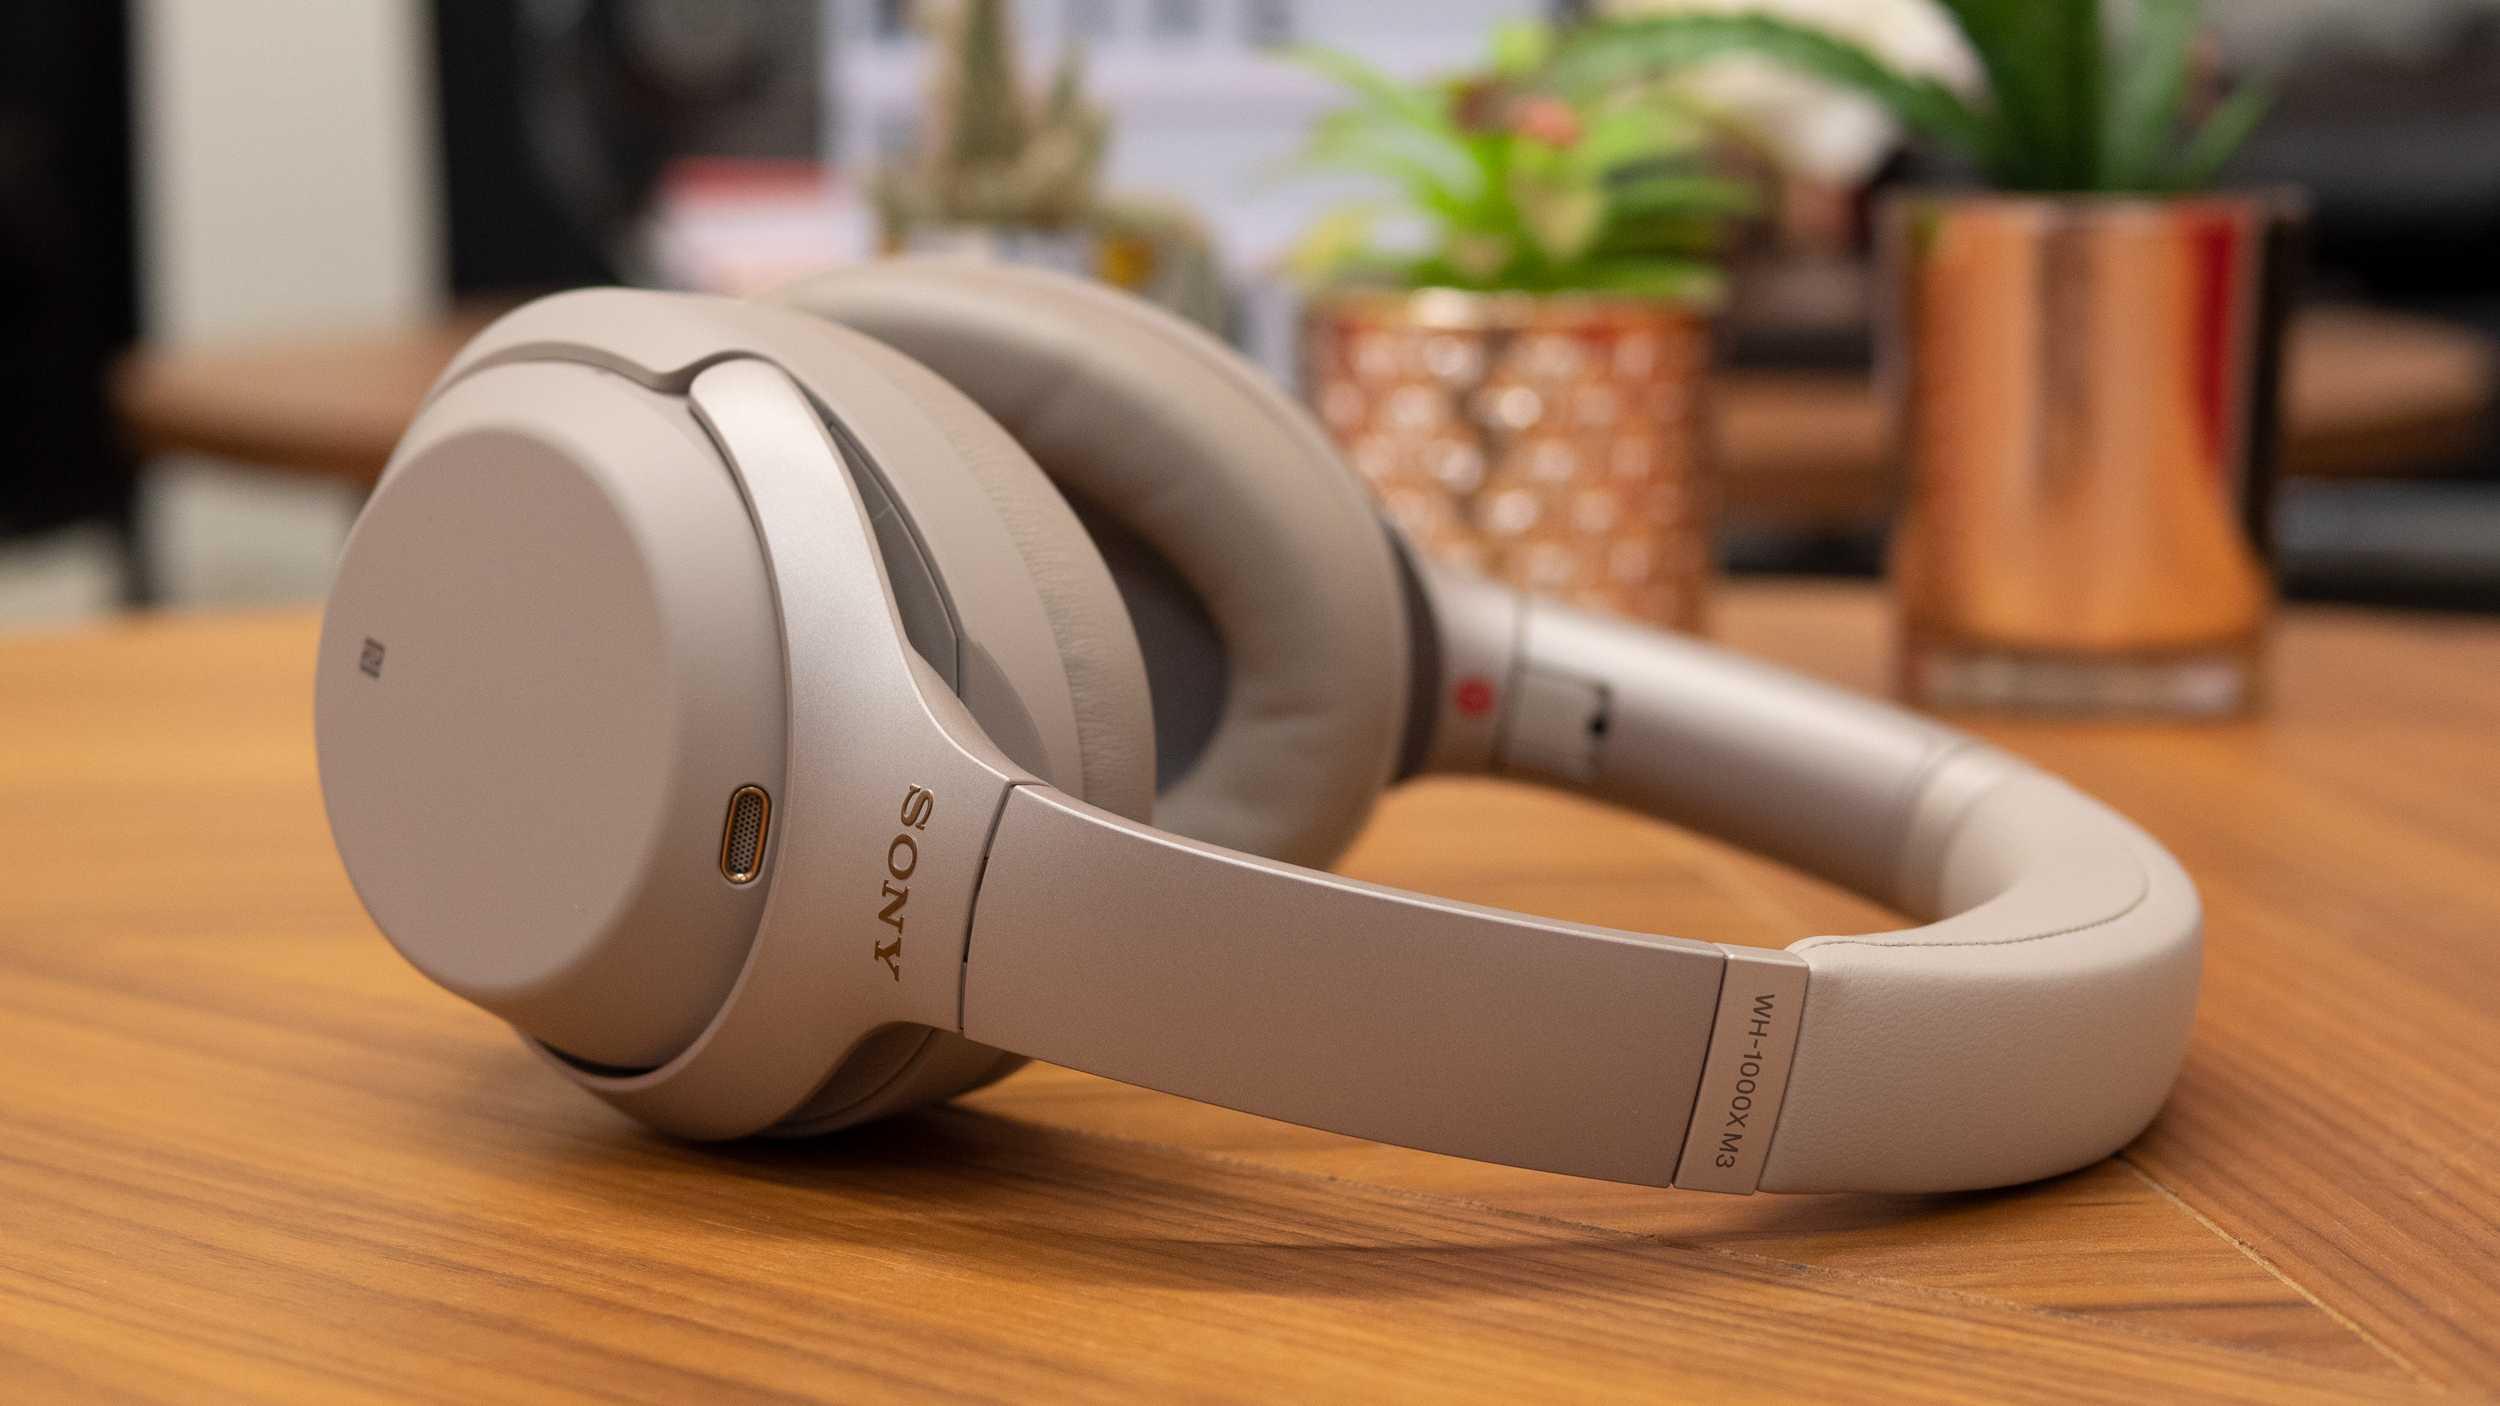 Обзор sony wh-1000xm4: наушники, которые вас слушают